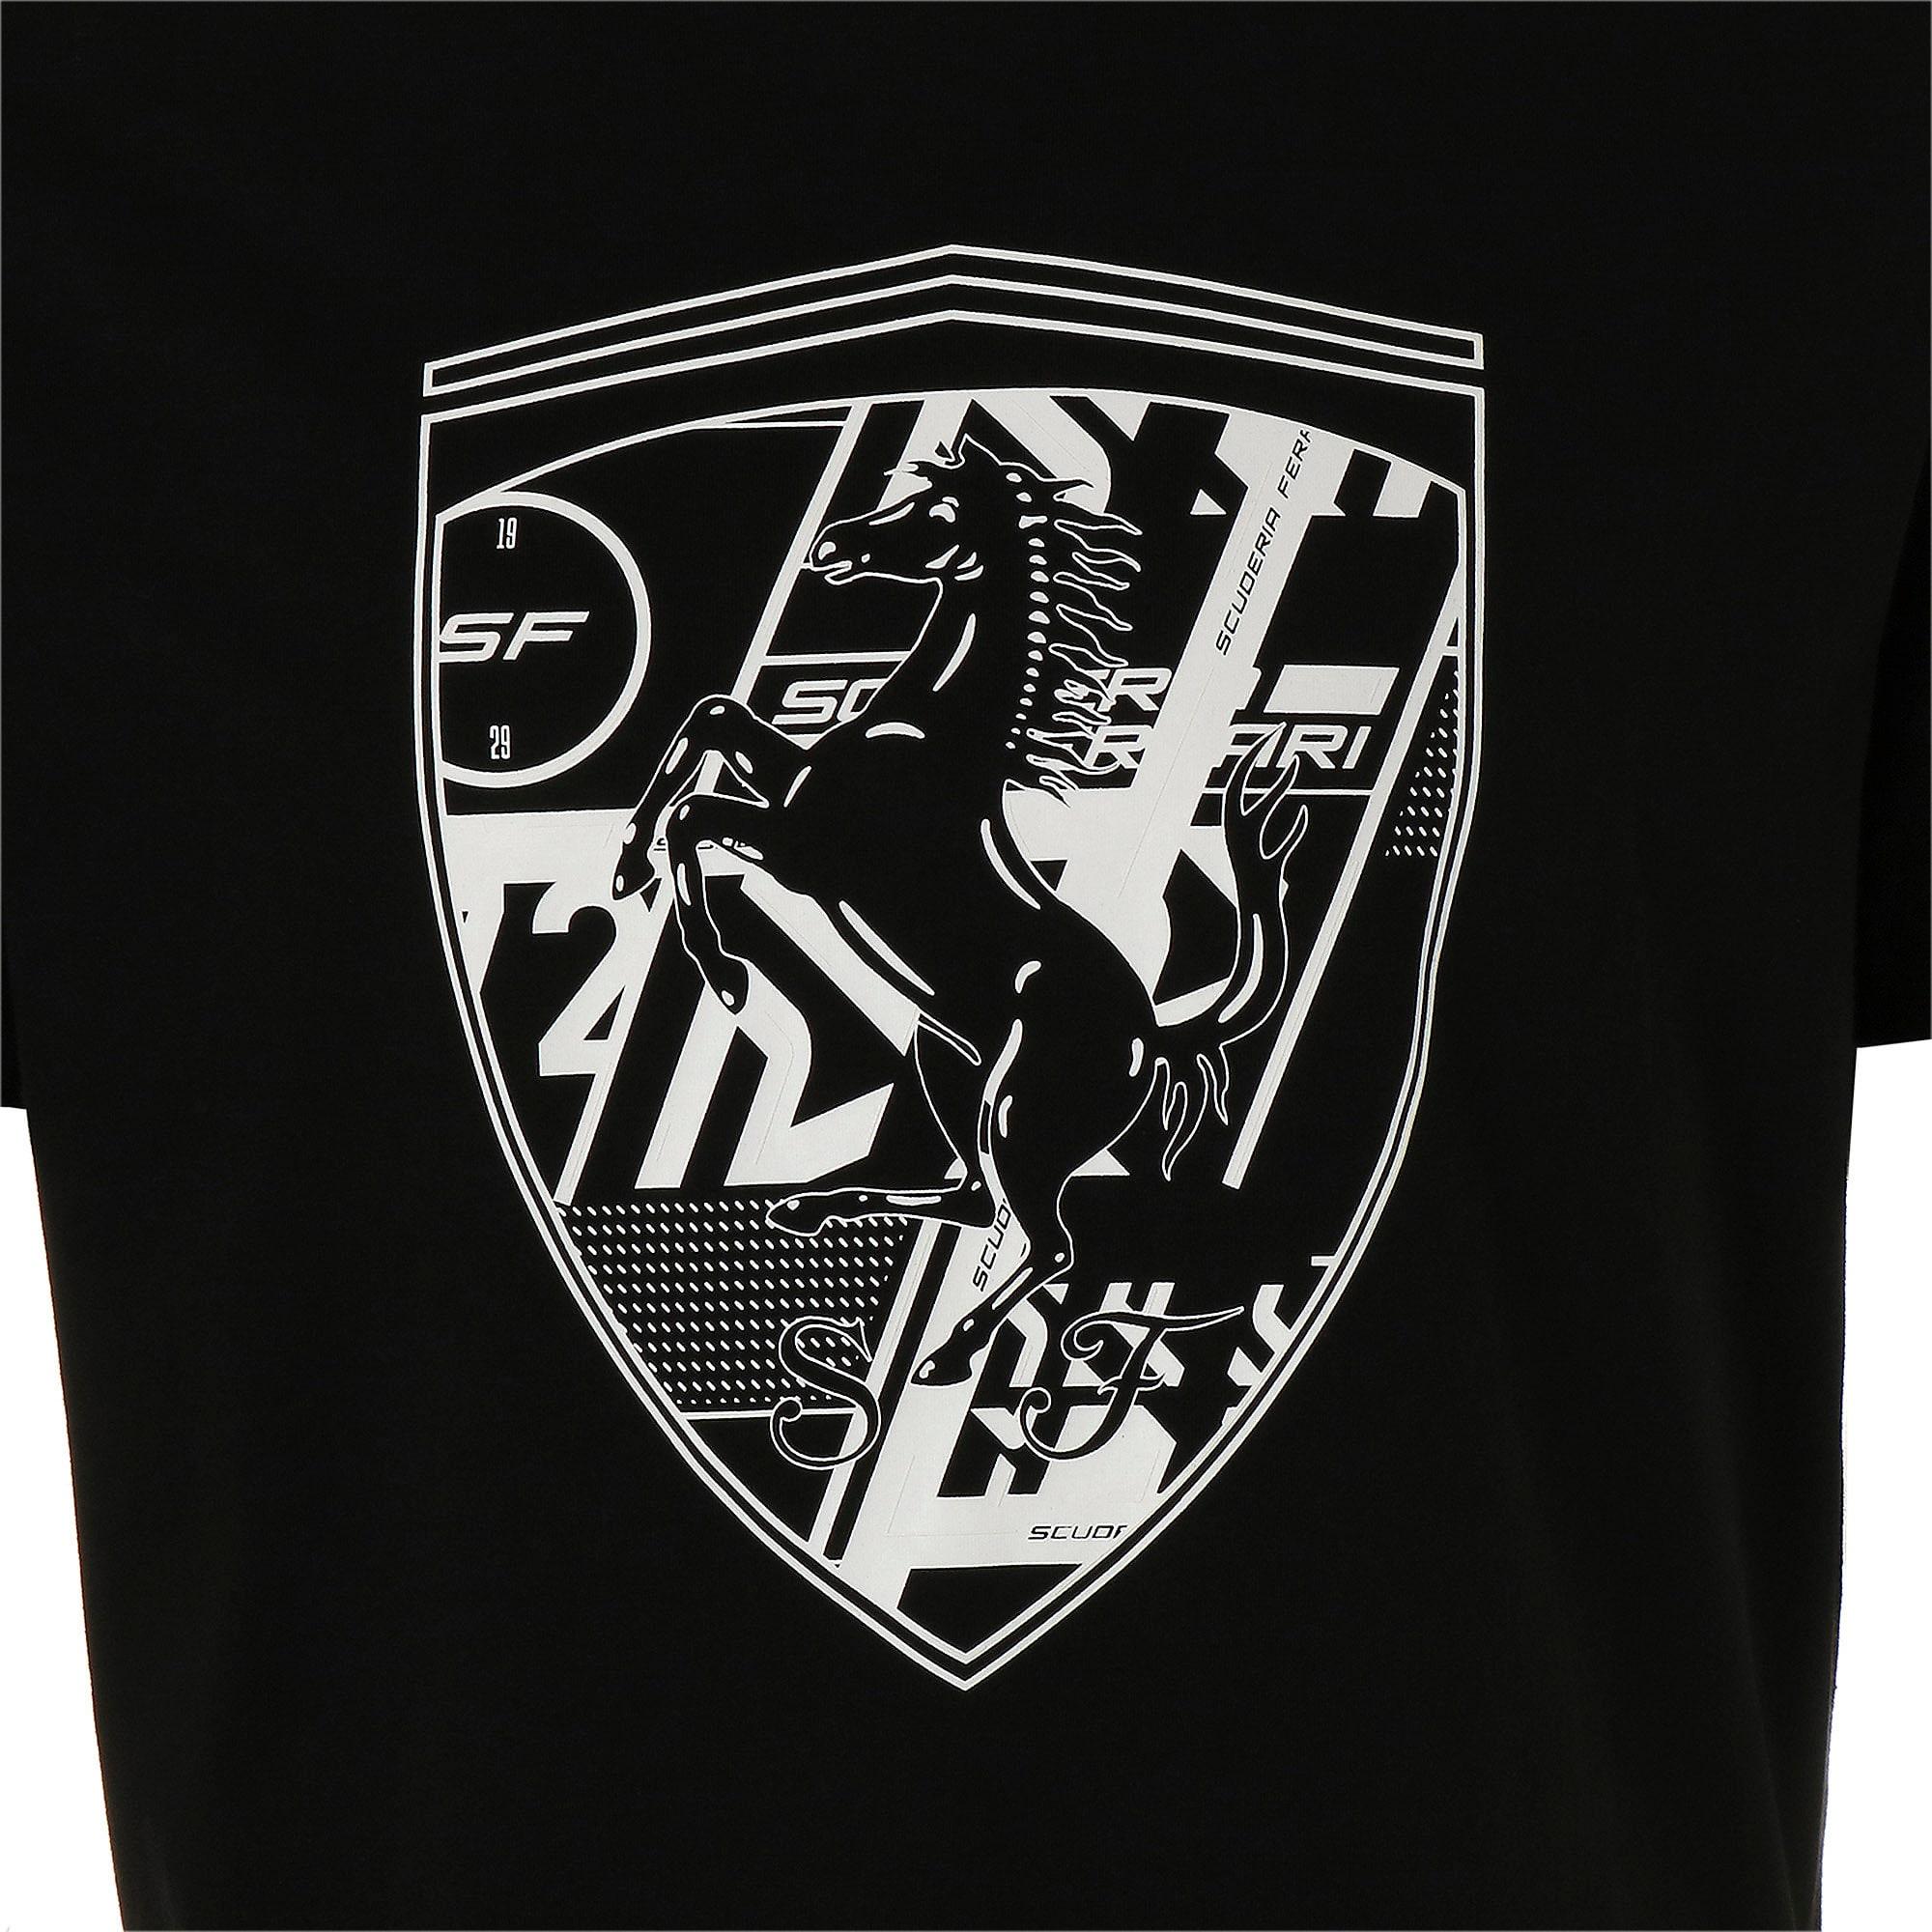 Thumbnail 7 of フェラーリ ビッグシールド Tシャツ + 半袖, Puma Black, medium-JPN